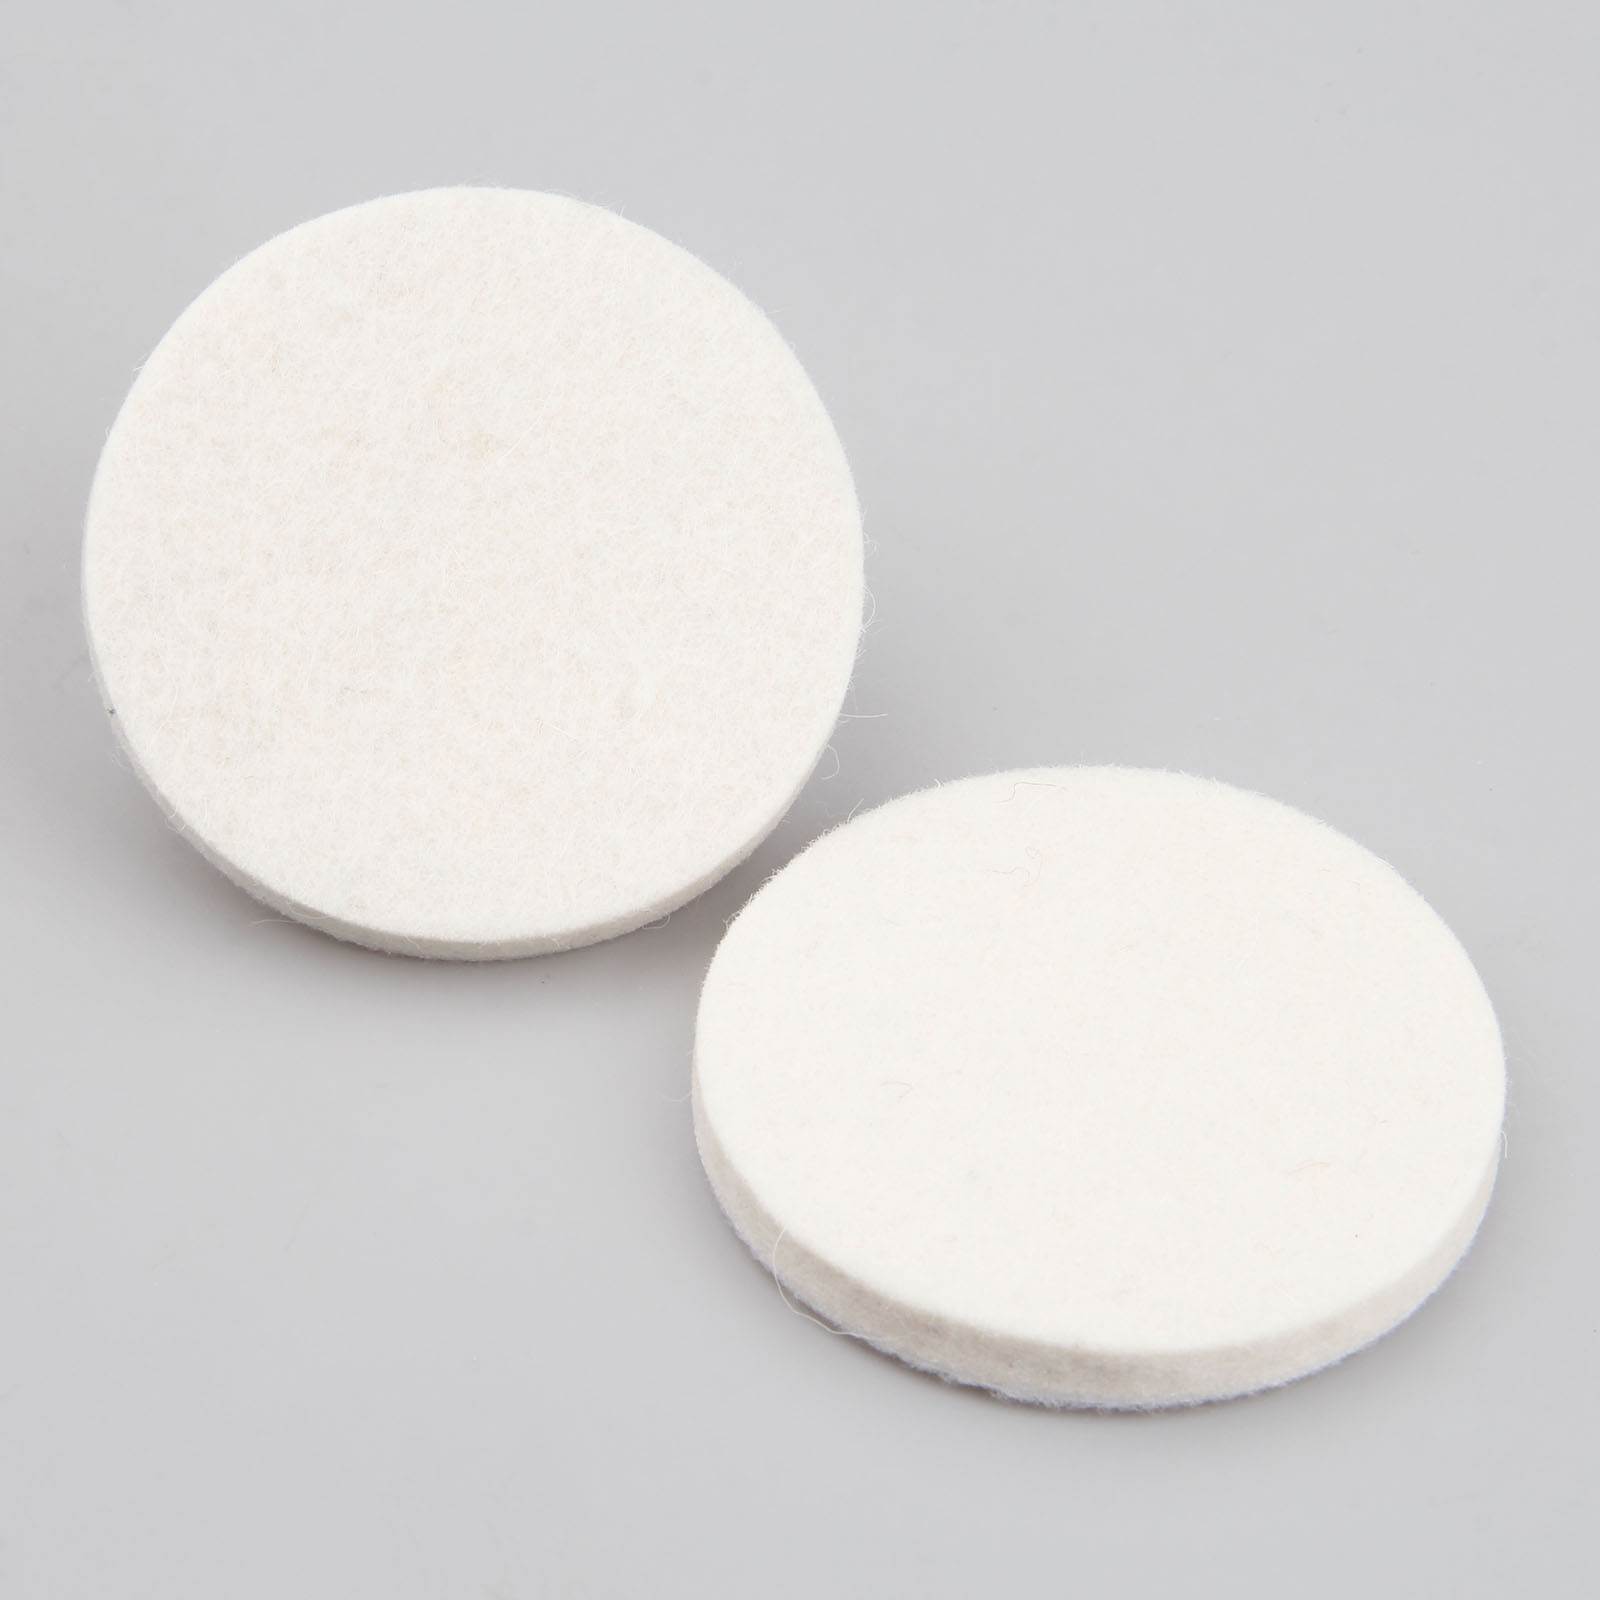 DRELD 2pc 3 Inch 75mm Polishing Pad Wool Felt Polishing Buffing Grind Round Wheel Polisher Disc Pad For Drill Dremel Rotary Tool